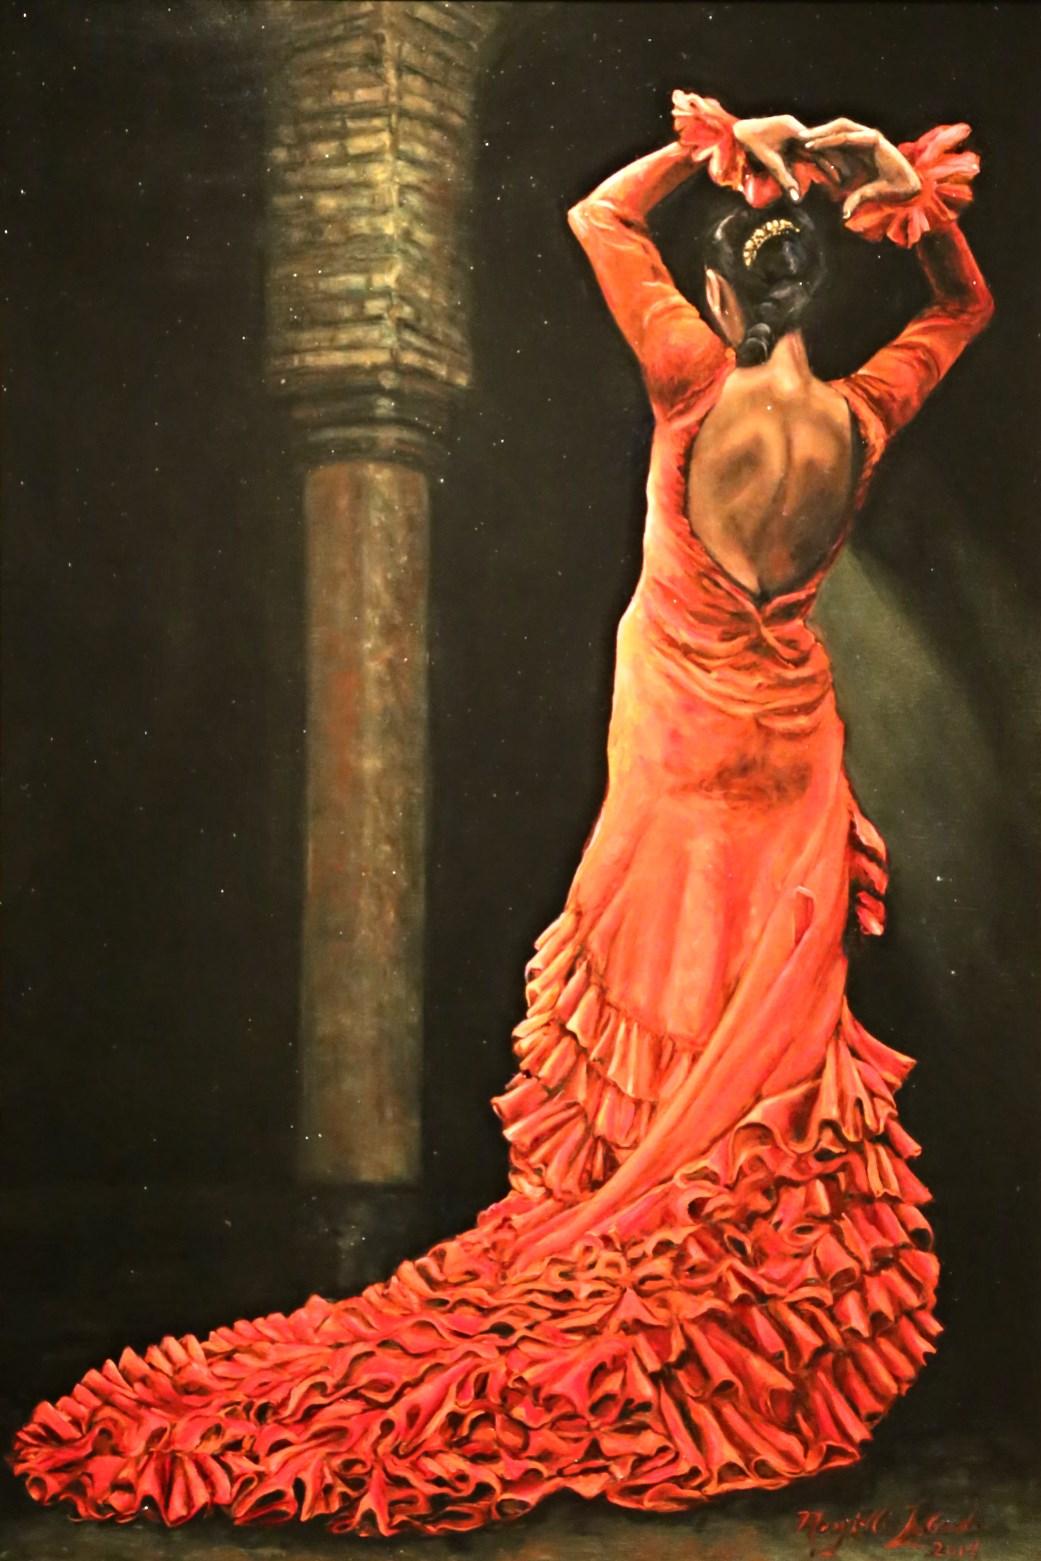 flamenco dancer in seville mary ellis lagarde mary ellis lagarde